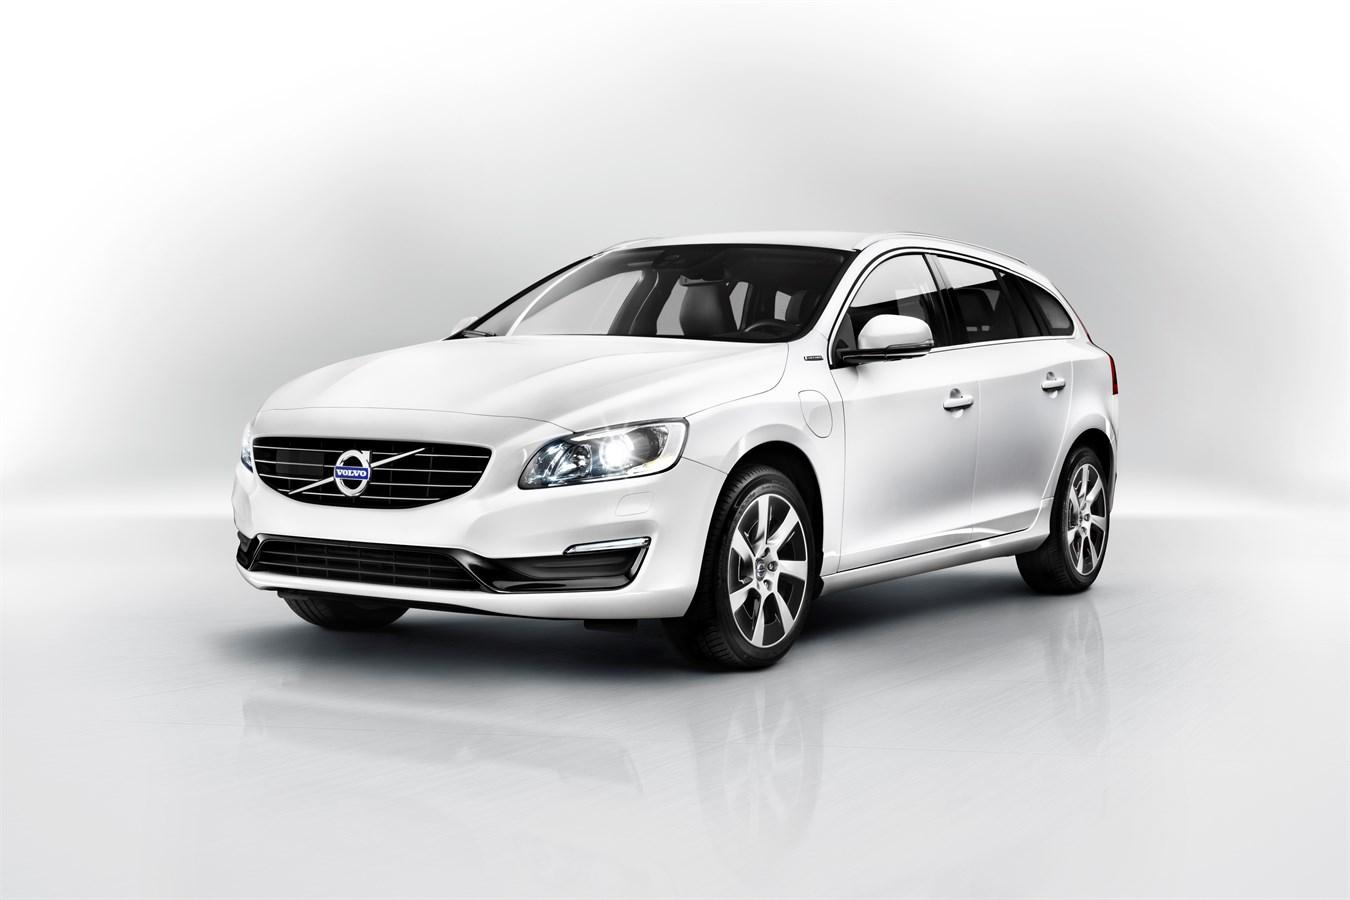 Volvo V60 Plug-in Hybrid – model year 2014 - Volvo Car Group Global